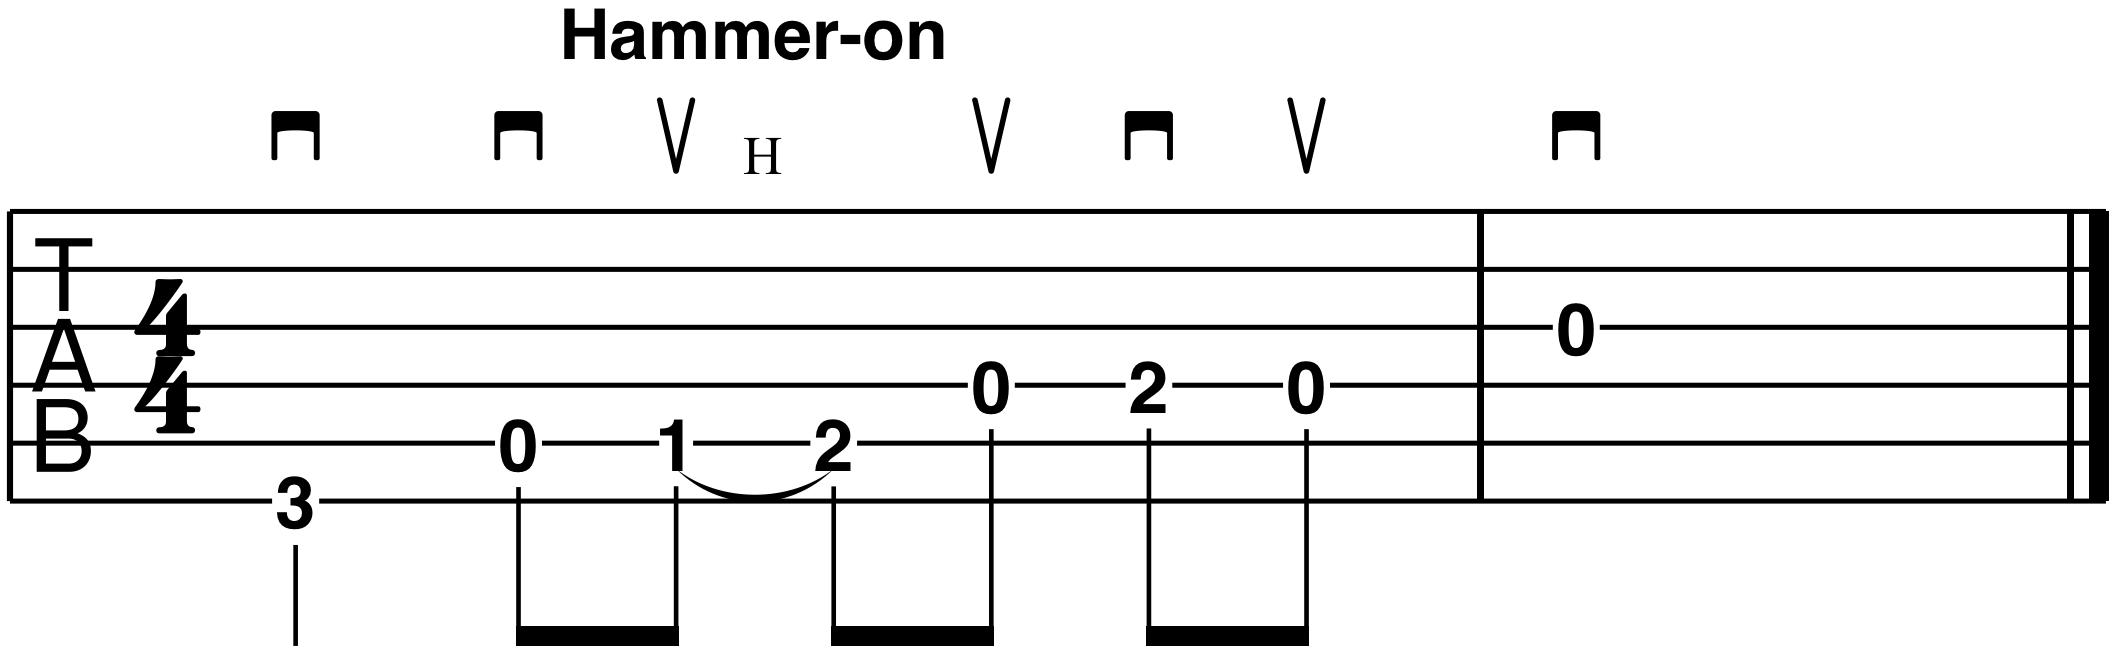 guitar tablature hammer ons